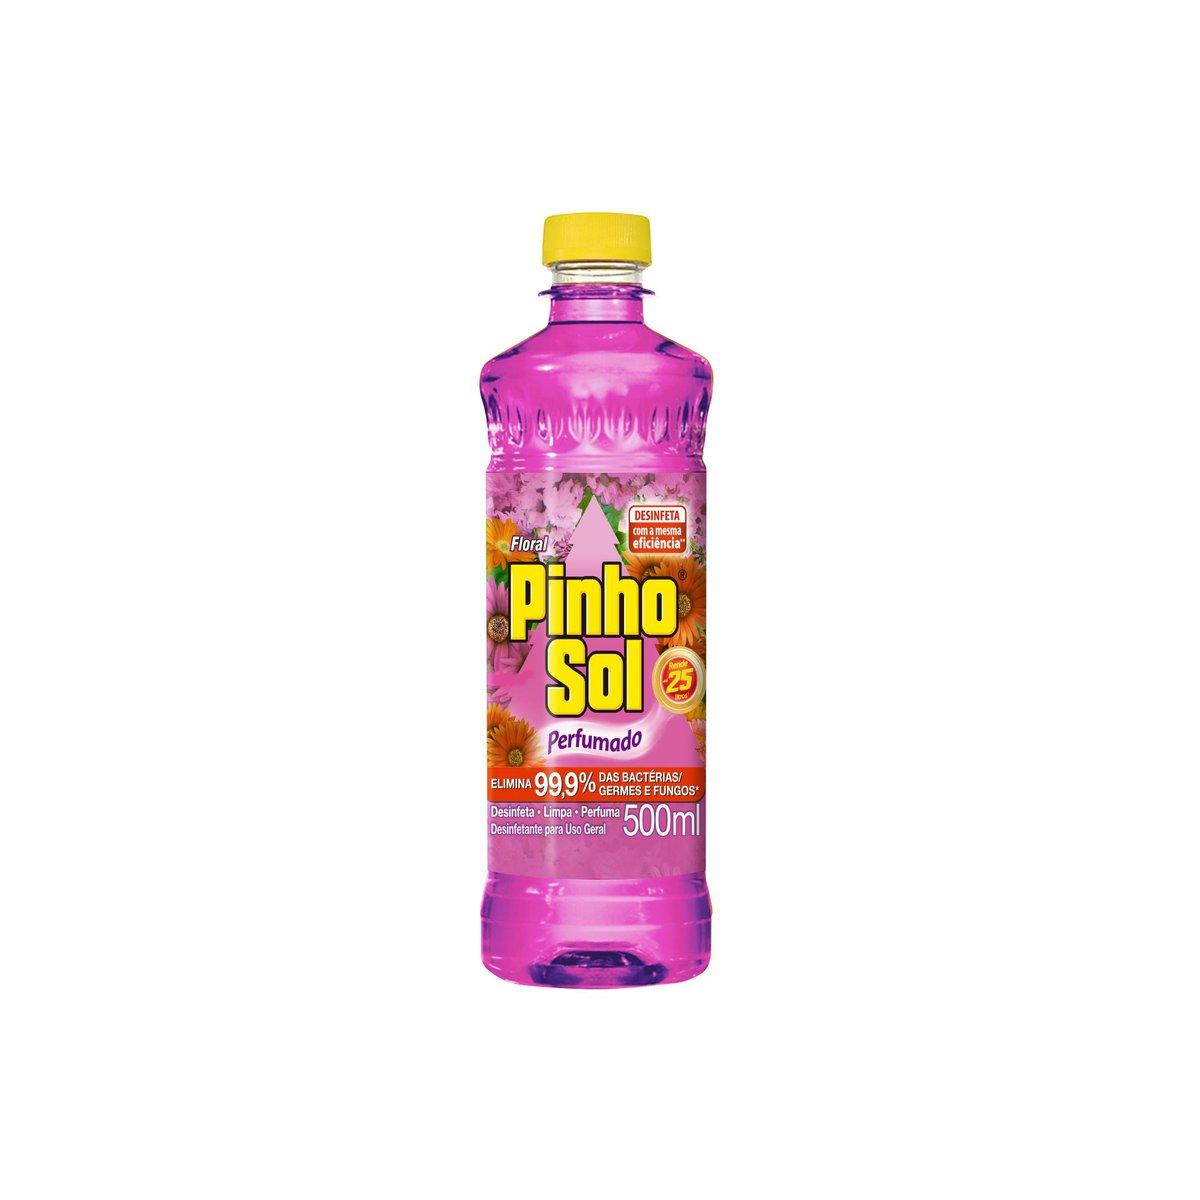 DESINF PINHO SOL FLORAL 1X500ML(12)